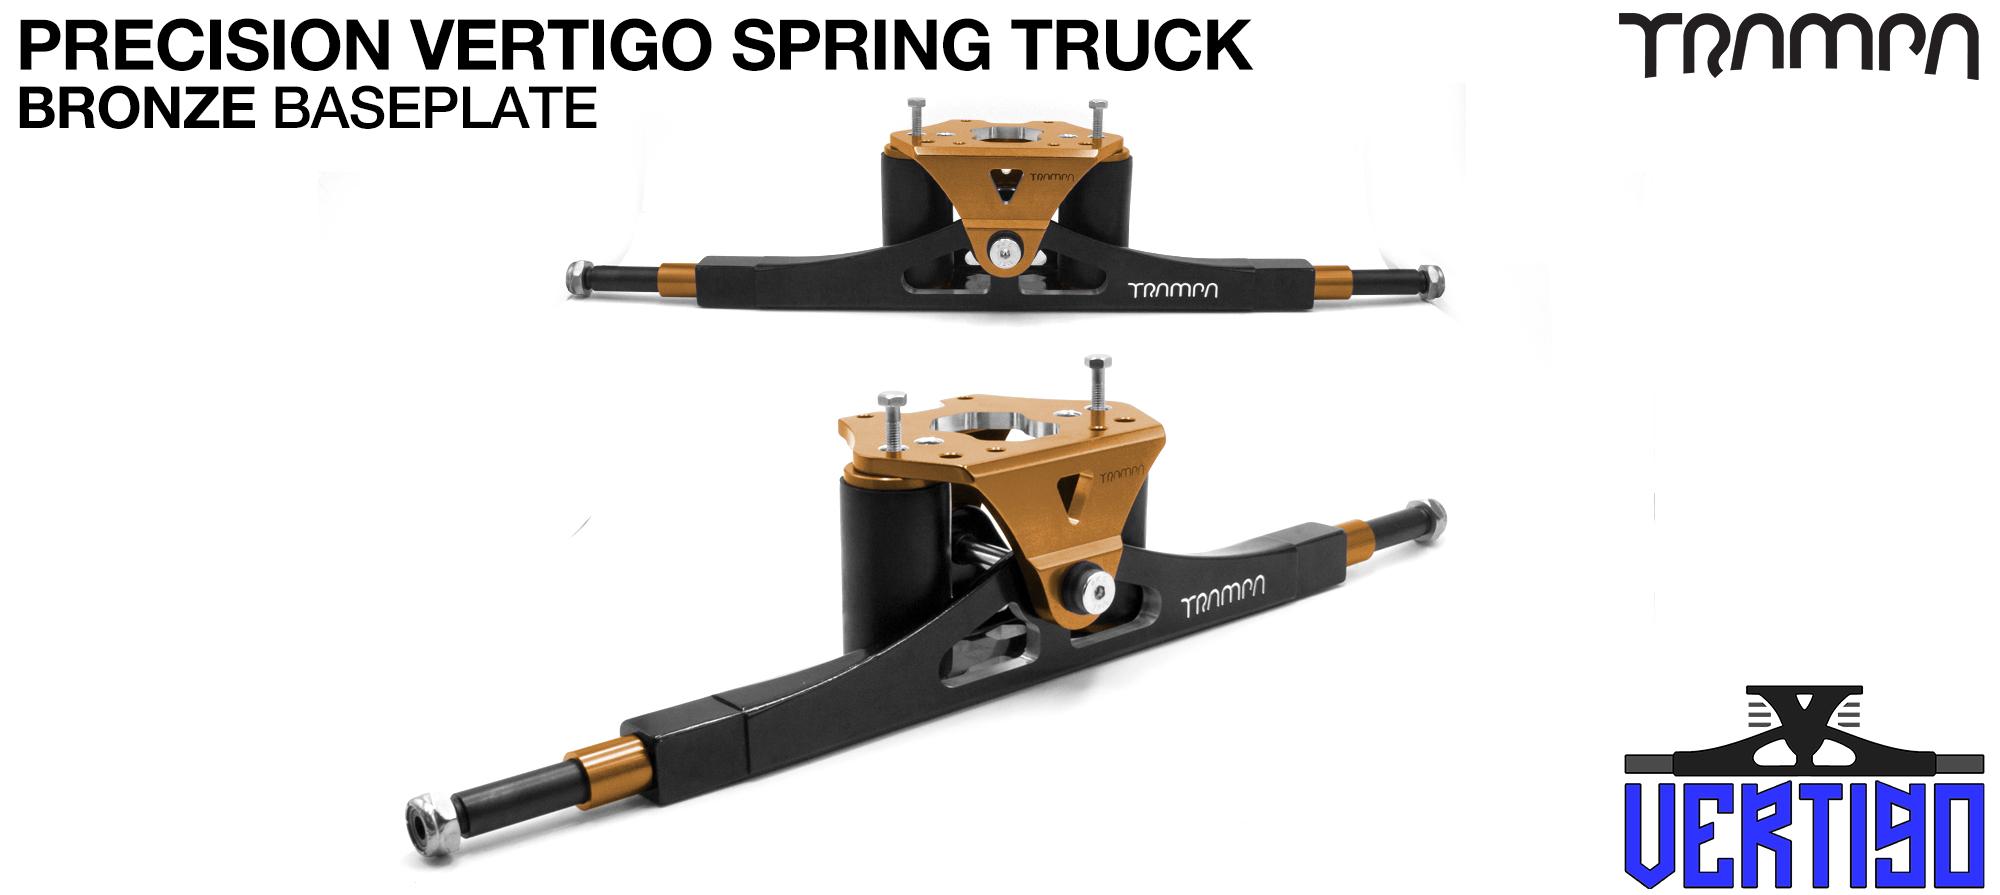 PRECISION CNC VERTIGO Truck Anodised BRONZE-  - 12mm Hollow Axles with GUNMETAL CNC baseplate Steel Kingpin TRAMPA Spring Trucks